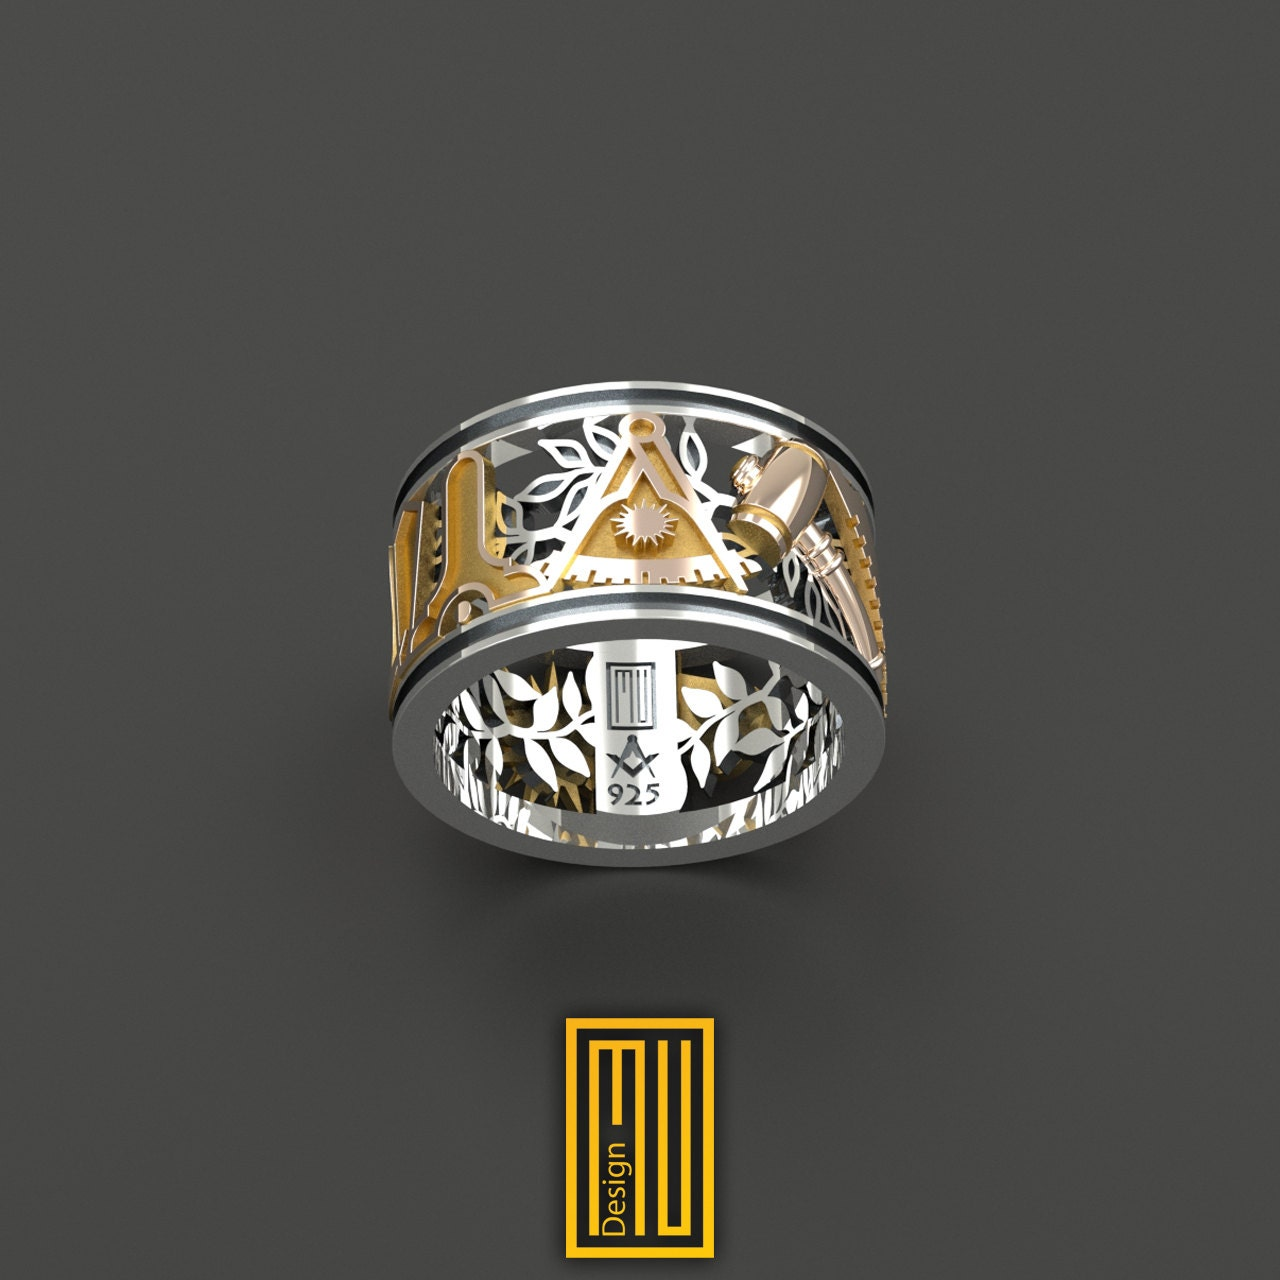 Masonic Wedding Style Past Master Ring Unique Design For Men